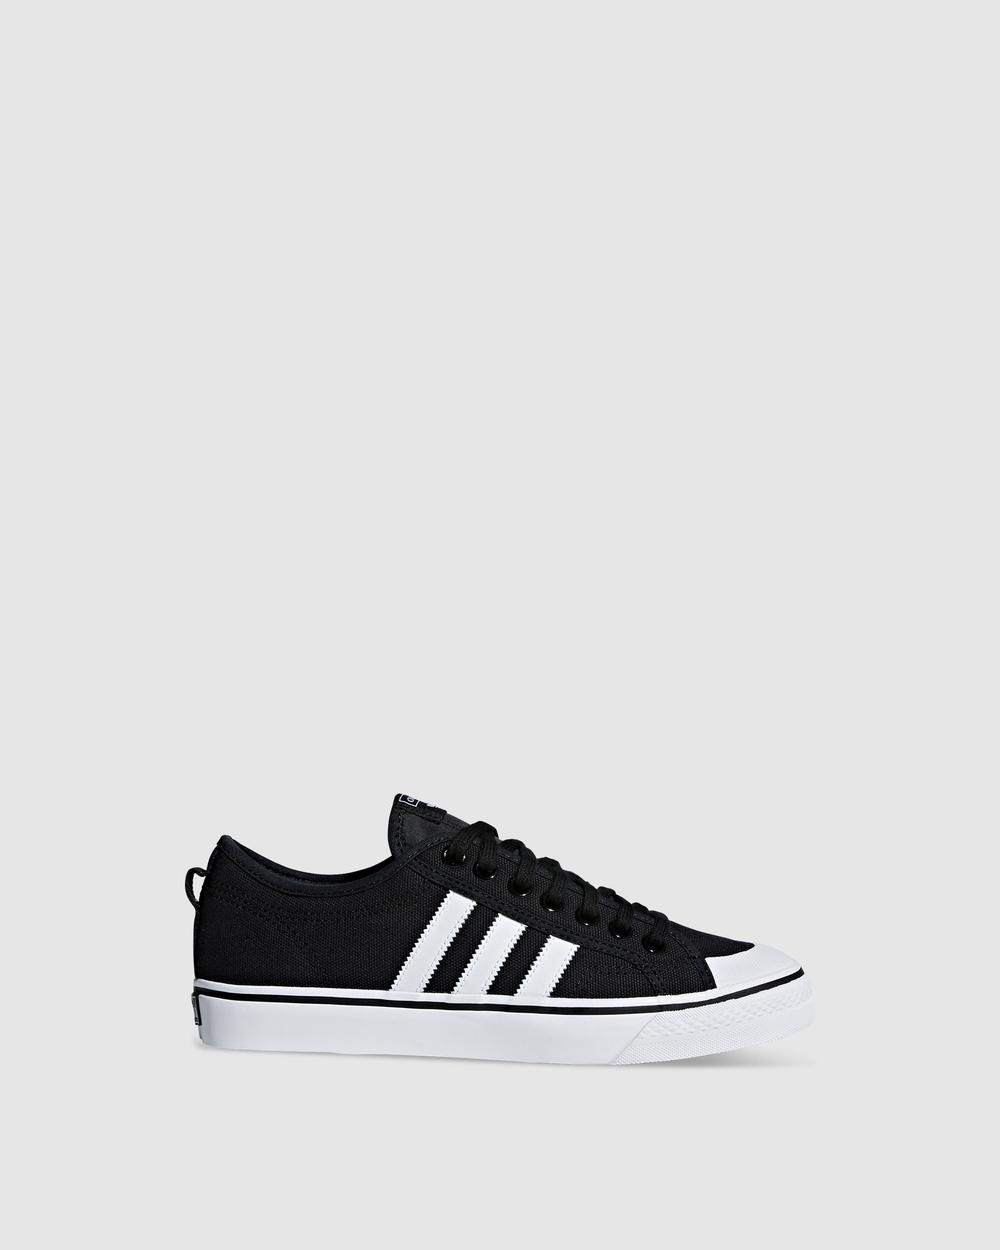 adidas Originals Nizza Shoes Sneakers Black